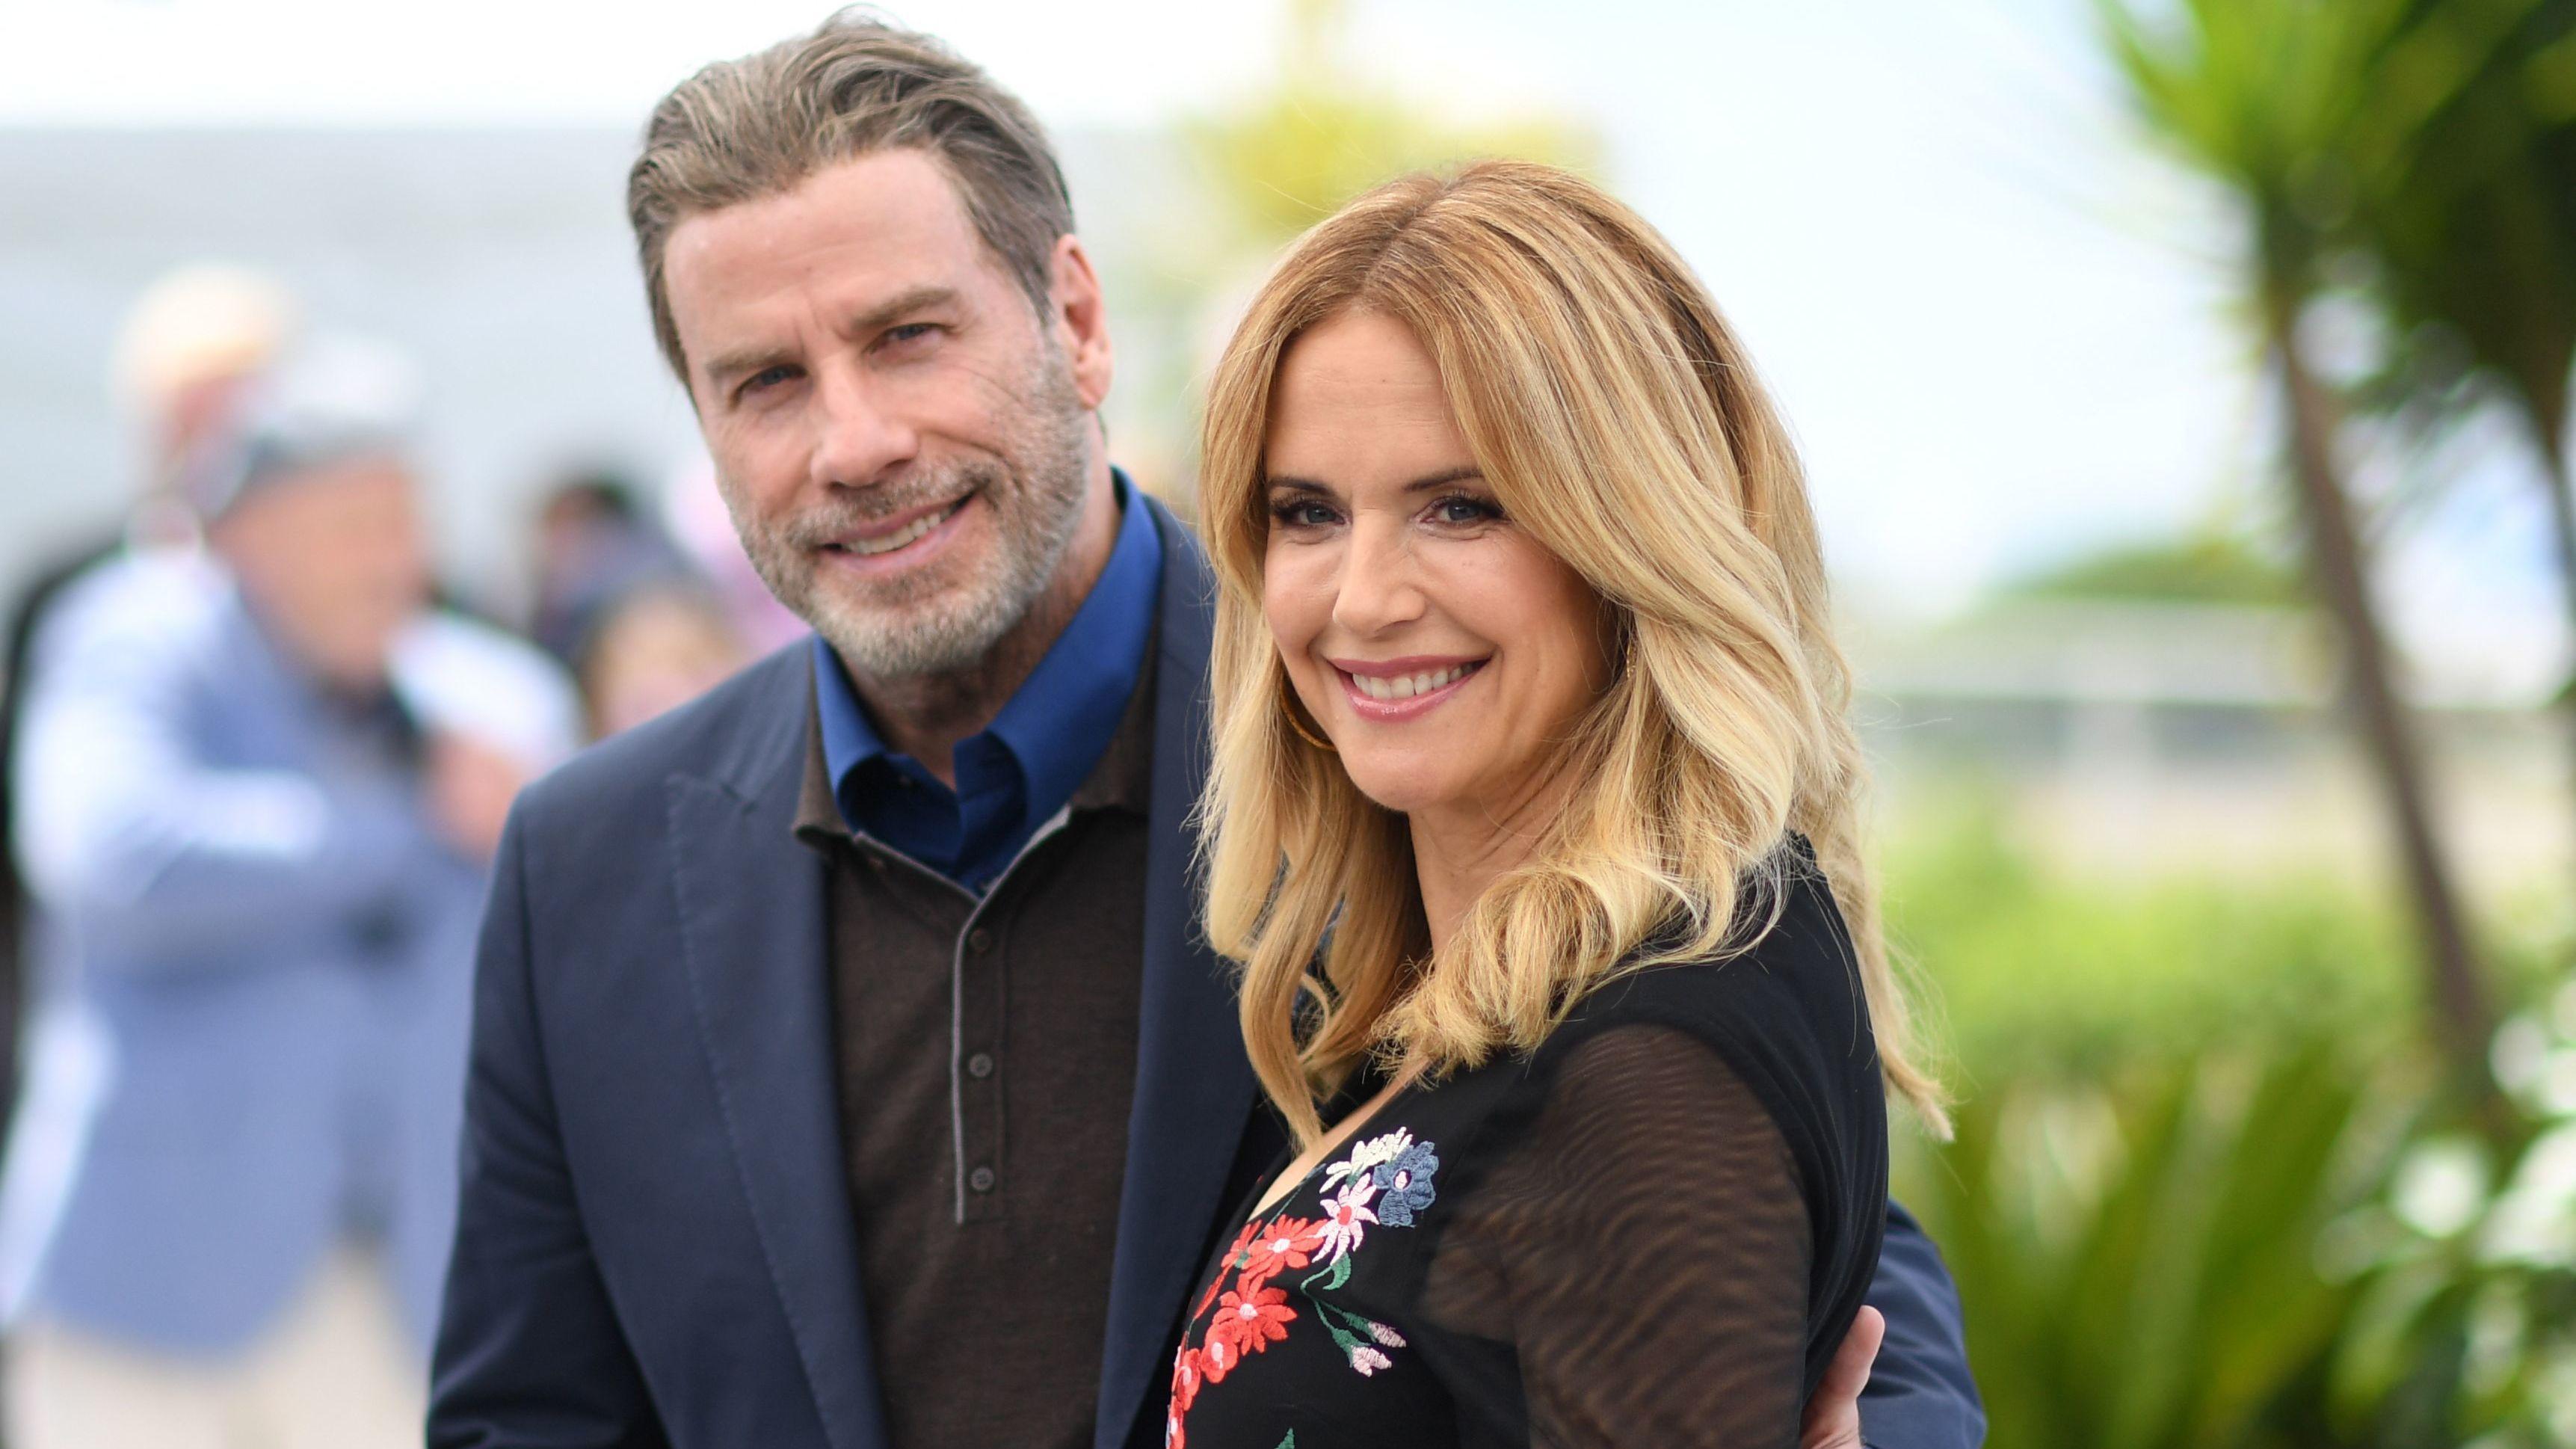 Kelly Preston, Actress And Wife Of John Travolta, Dead At